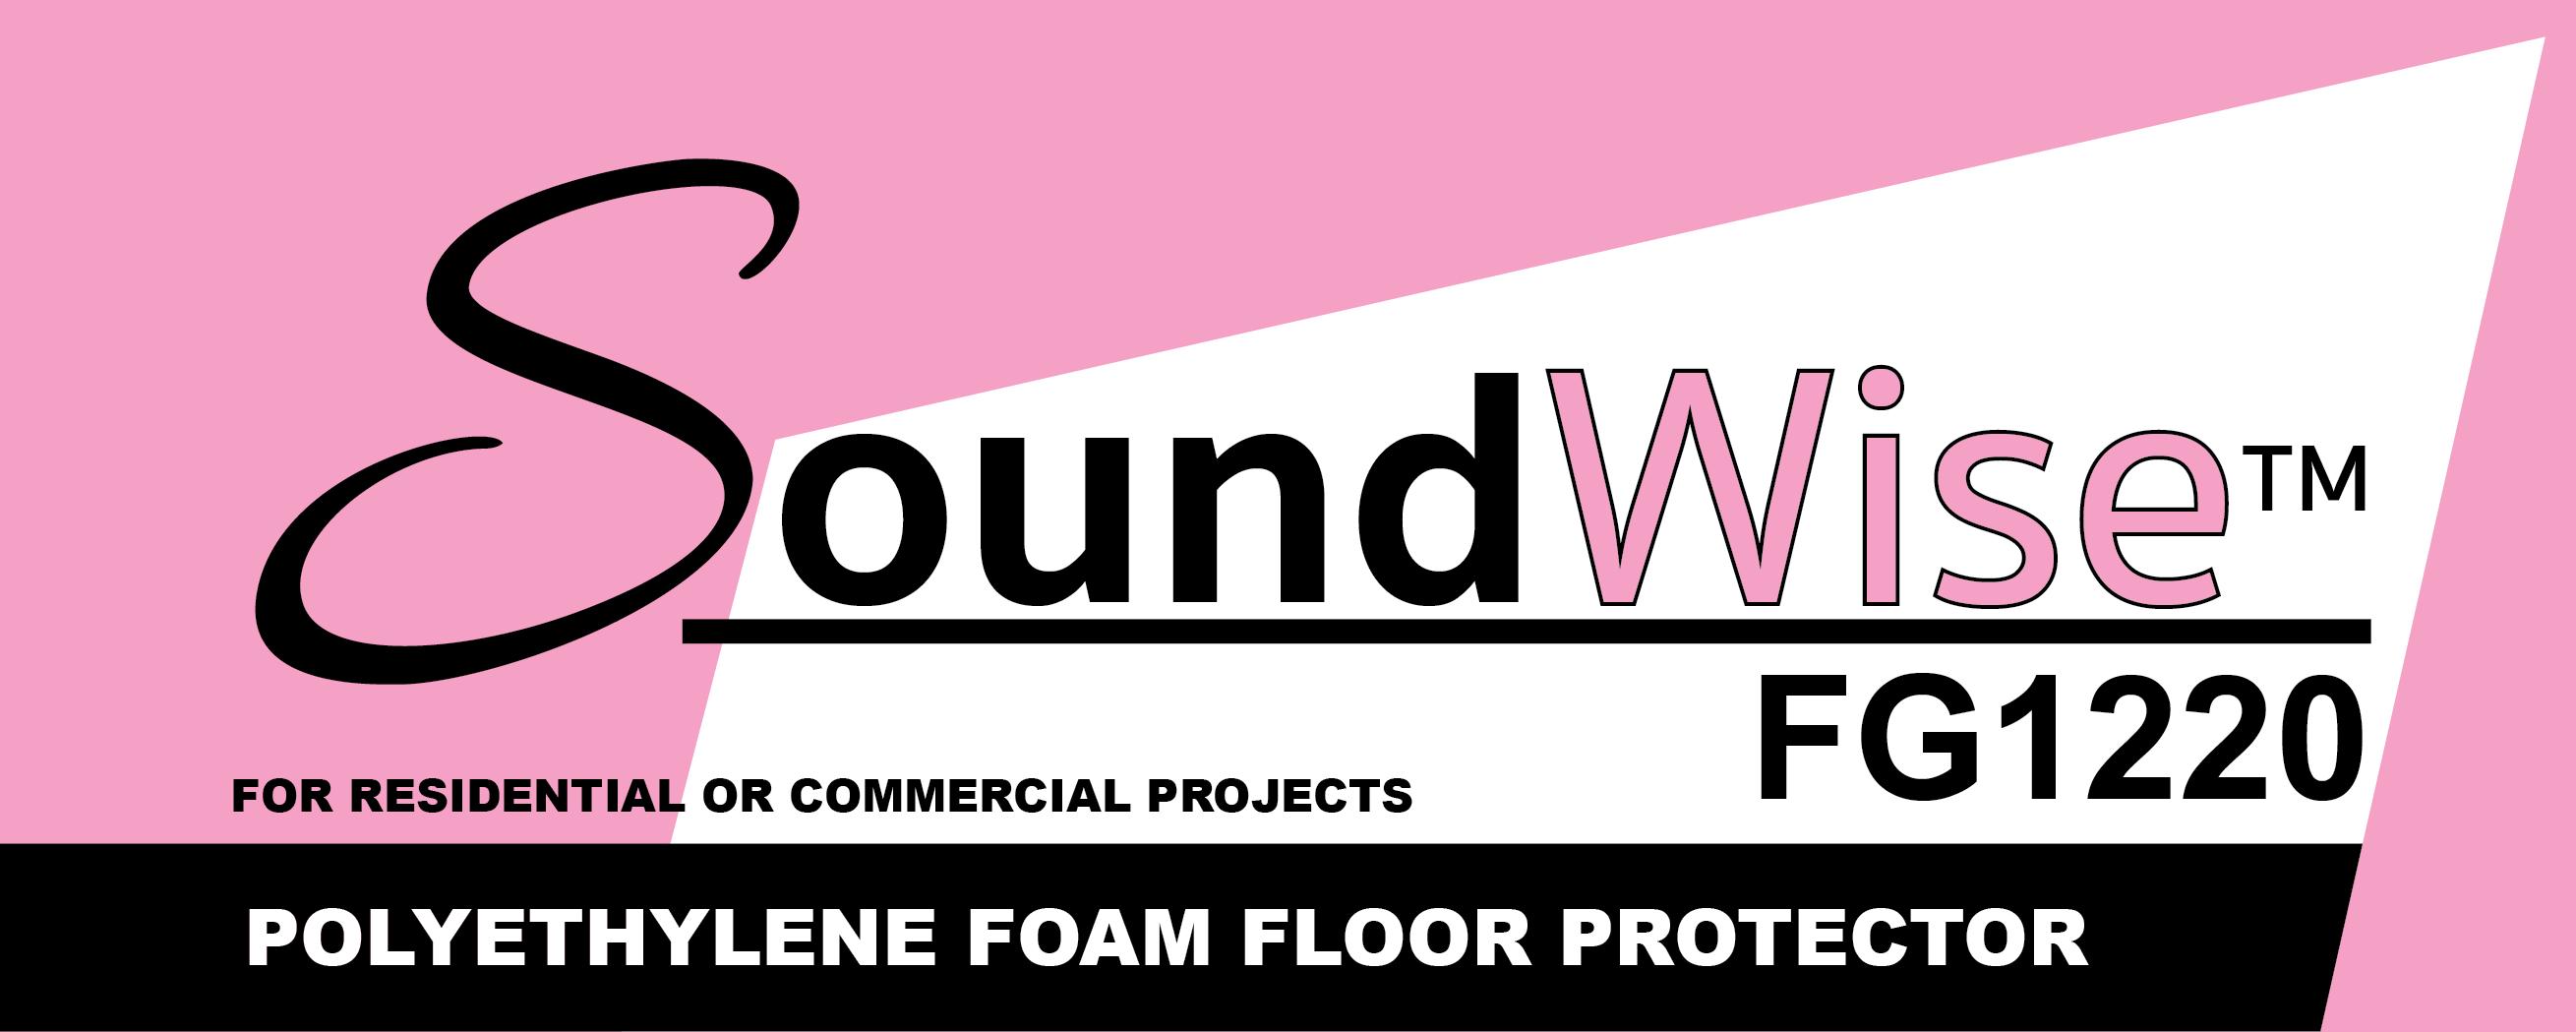 Soundwise FG 1220 Polyethylene Foam Floor Protector